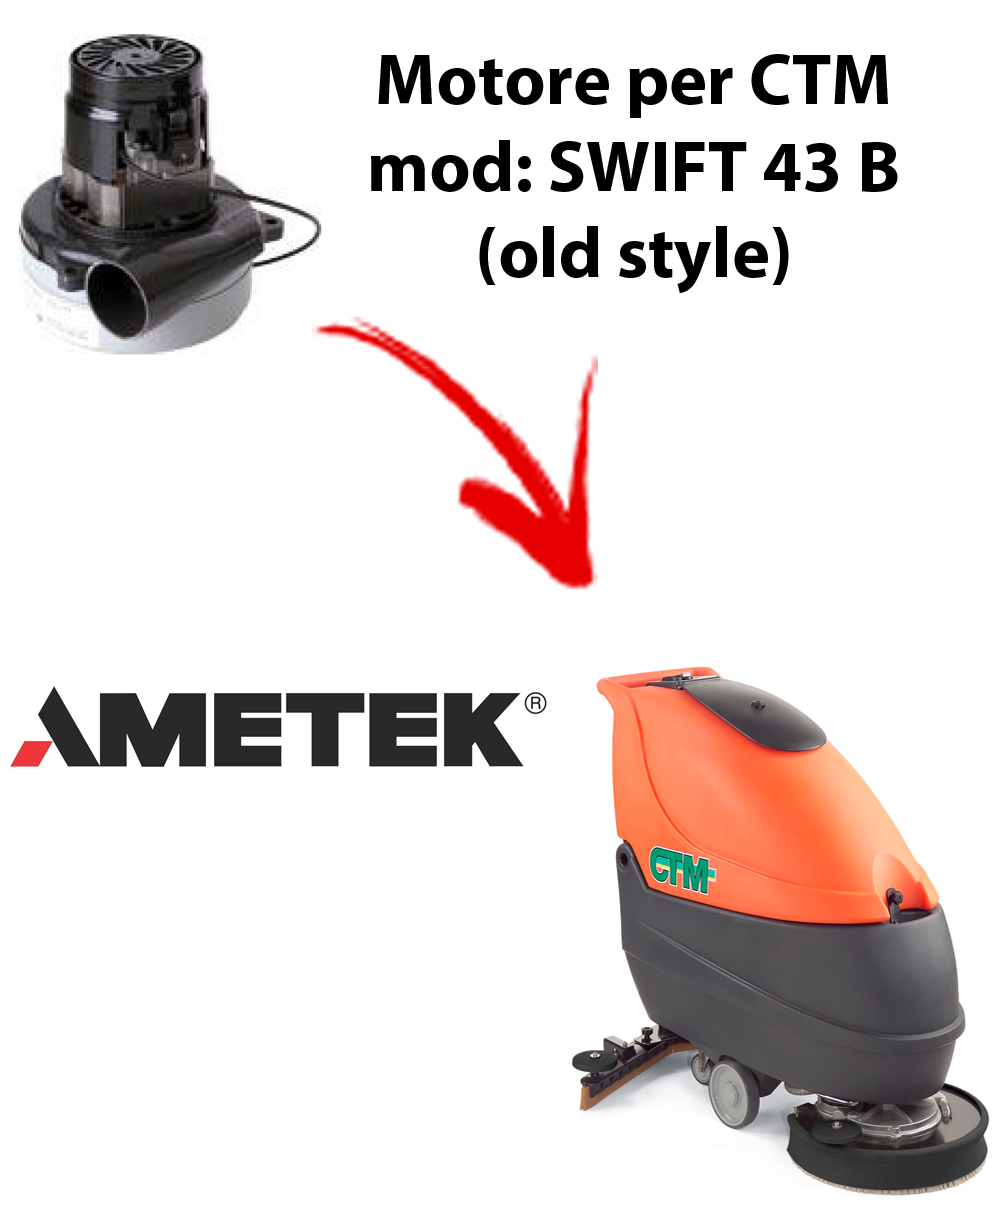 SWIFT 43B Old Style Motore de aspiración AMETEK para fregadora CTM